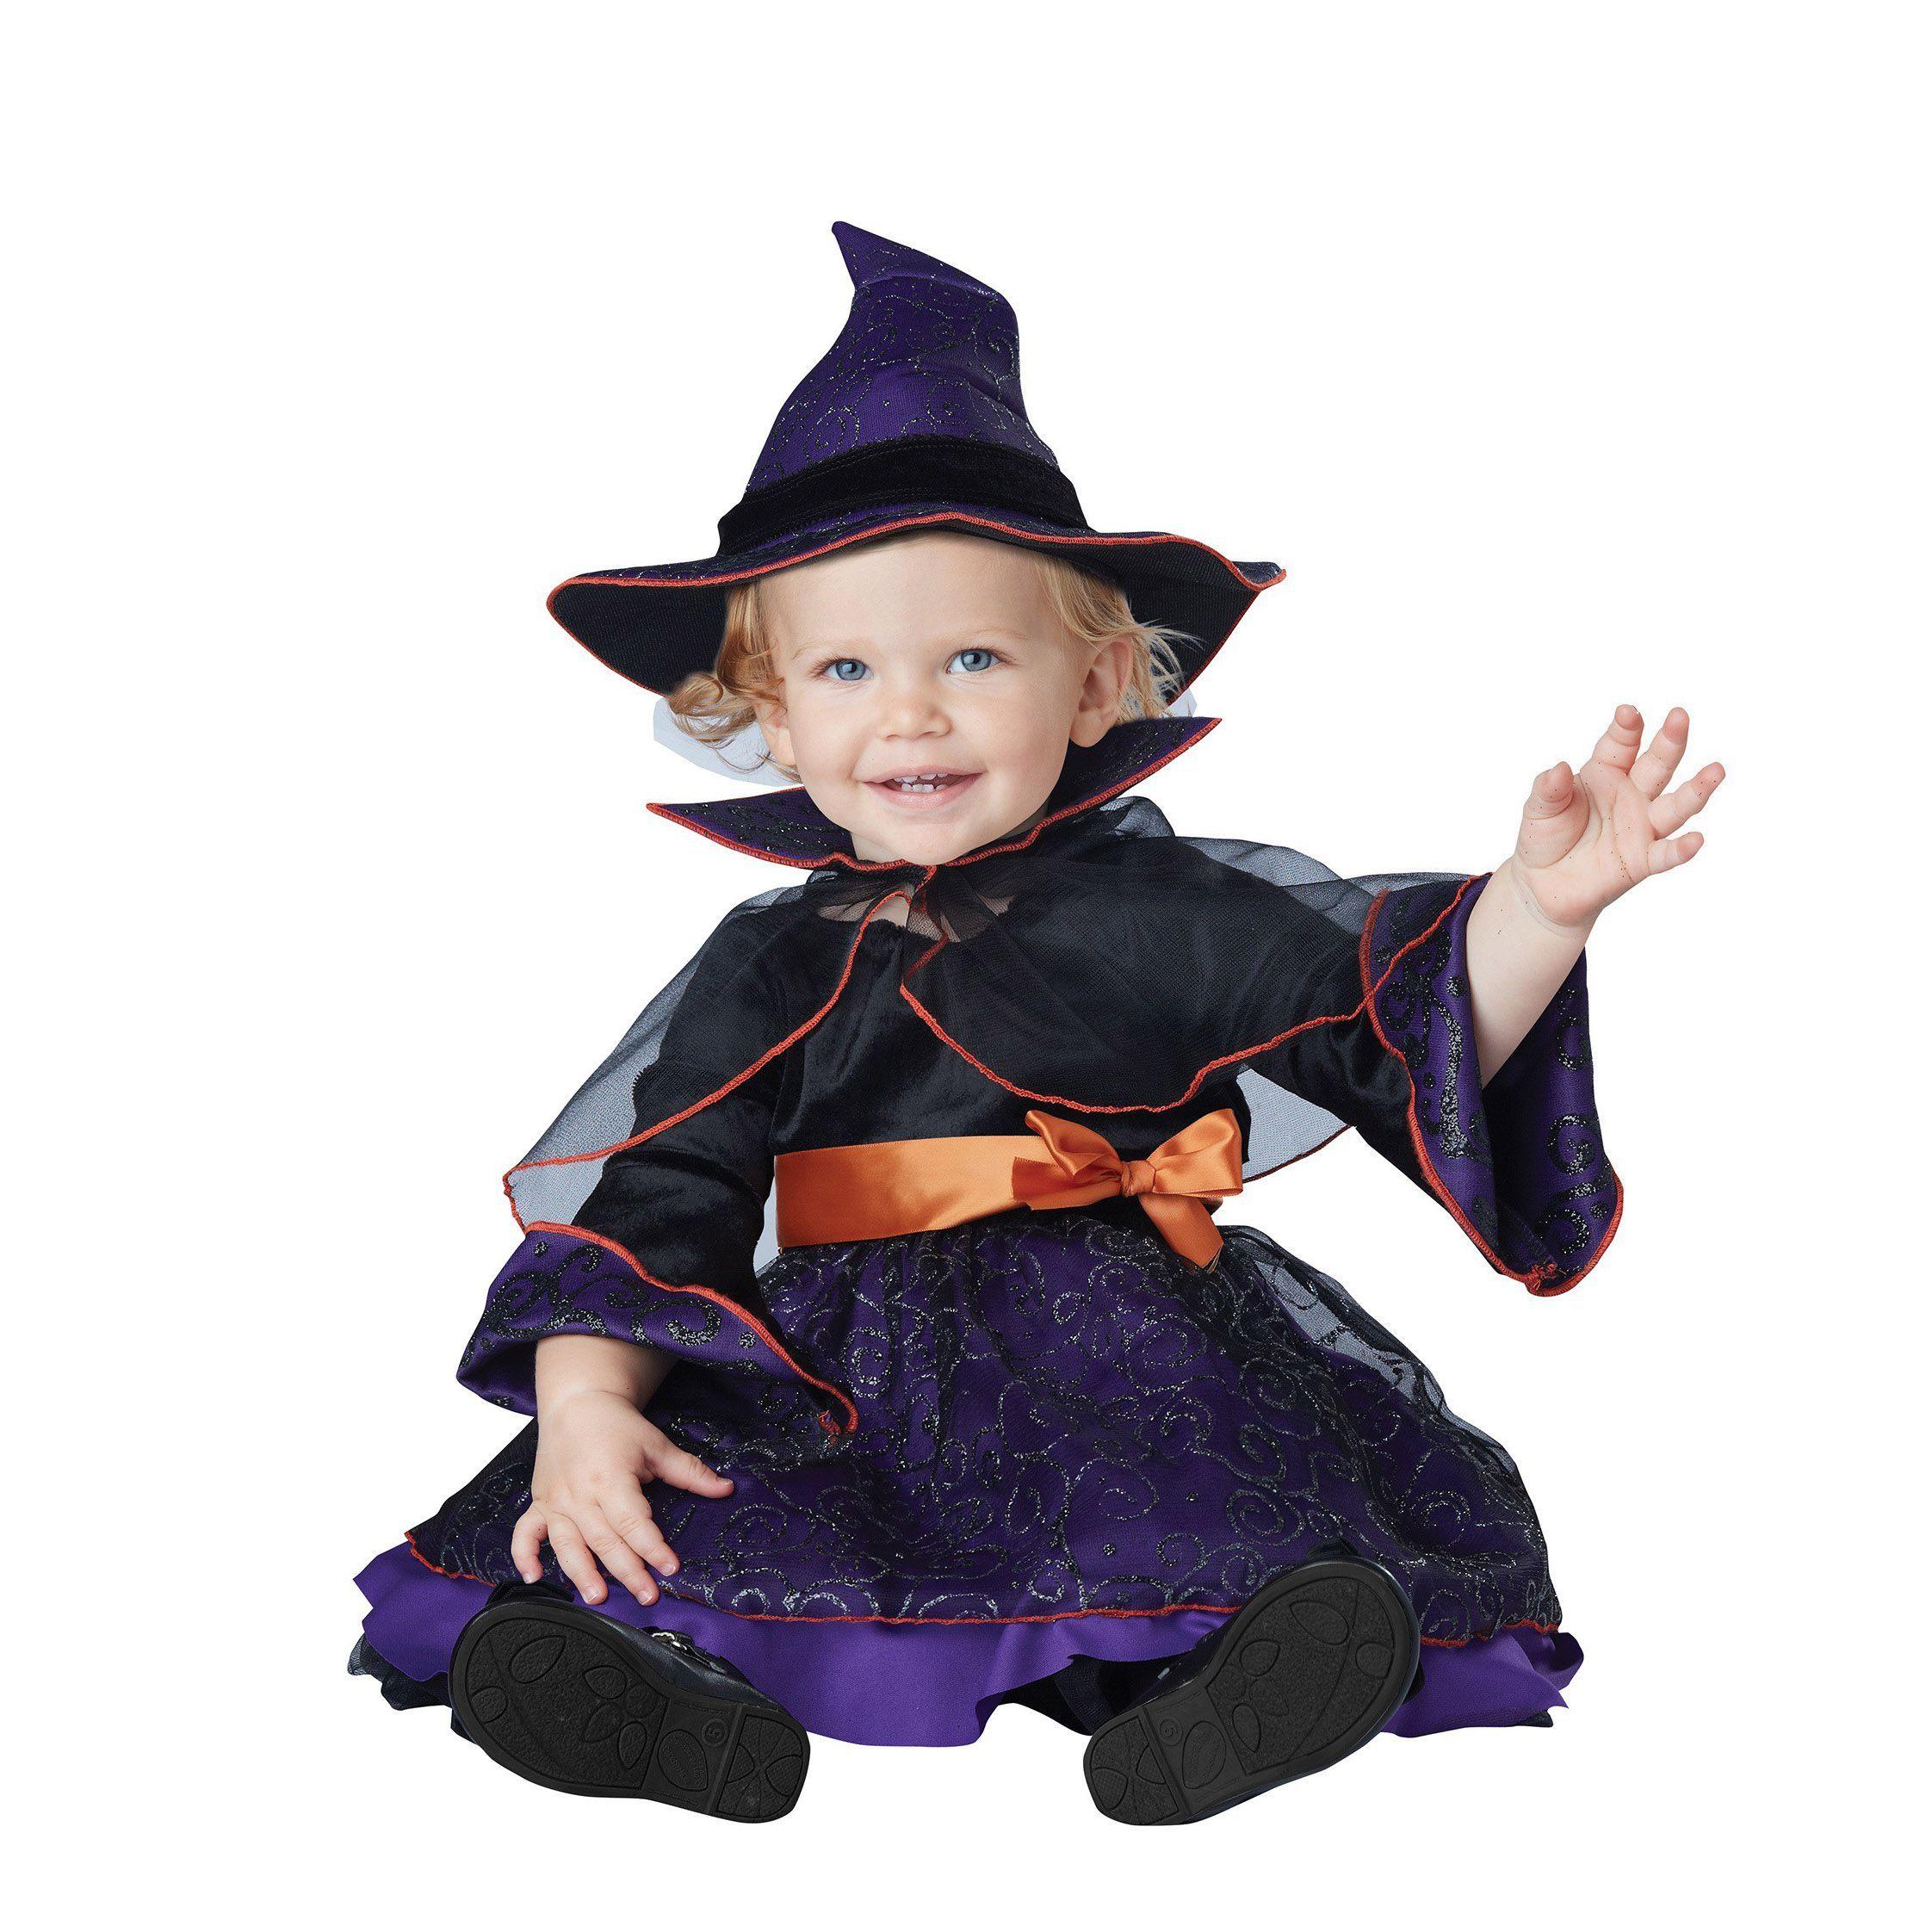 16 best hocus pocus costumes - shop sanderson sisters halloween costumes